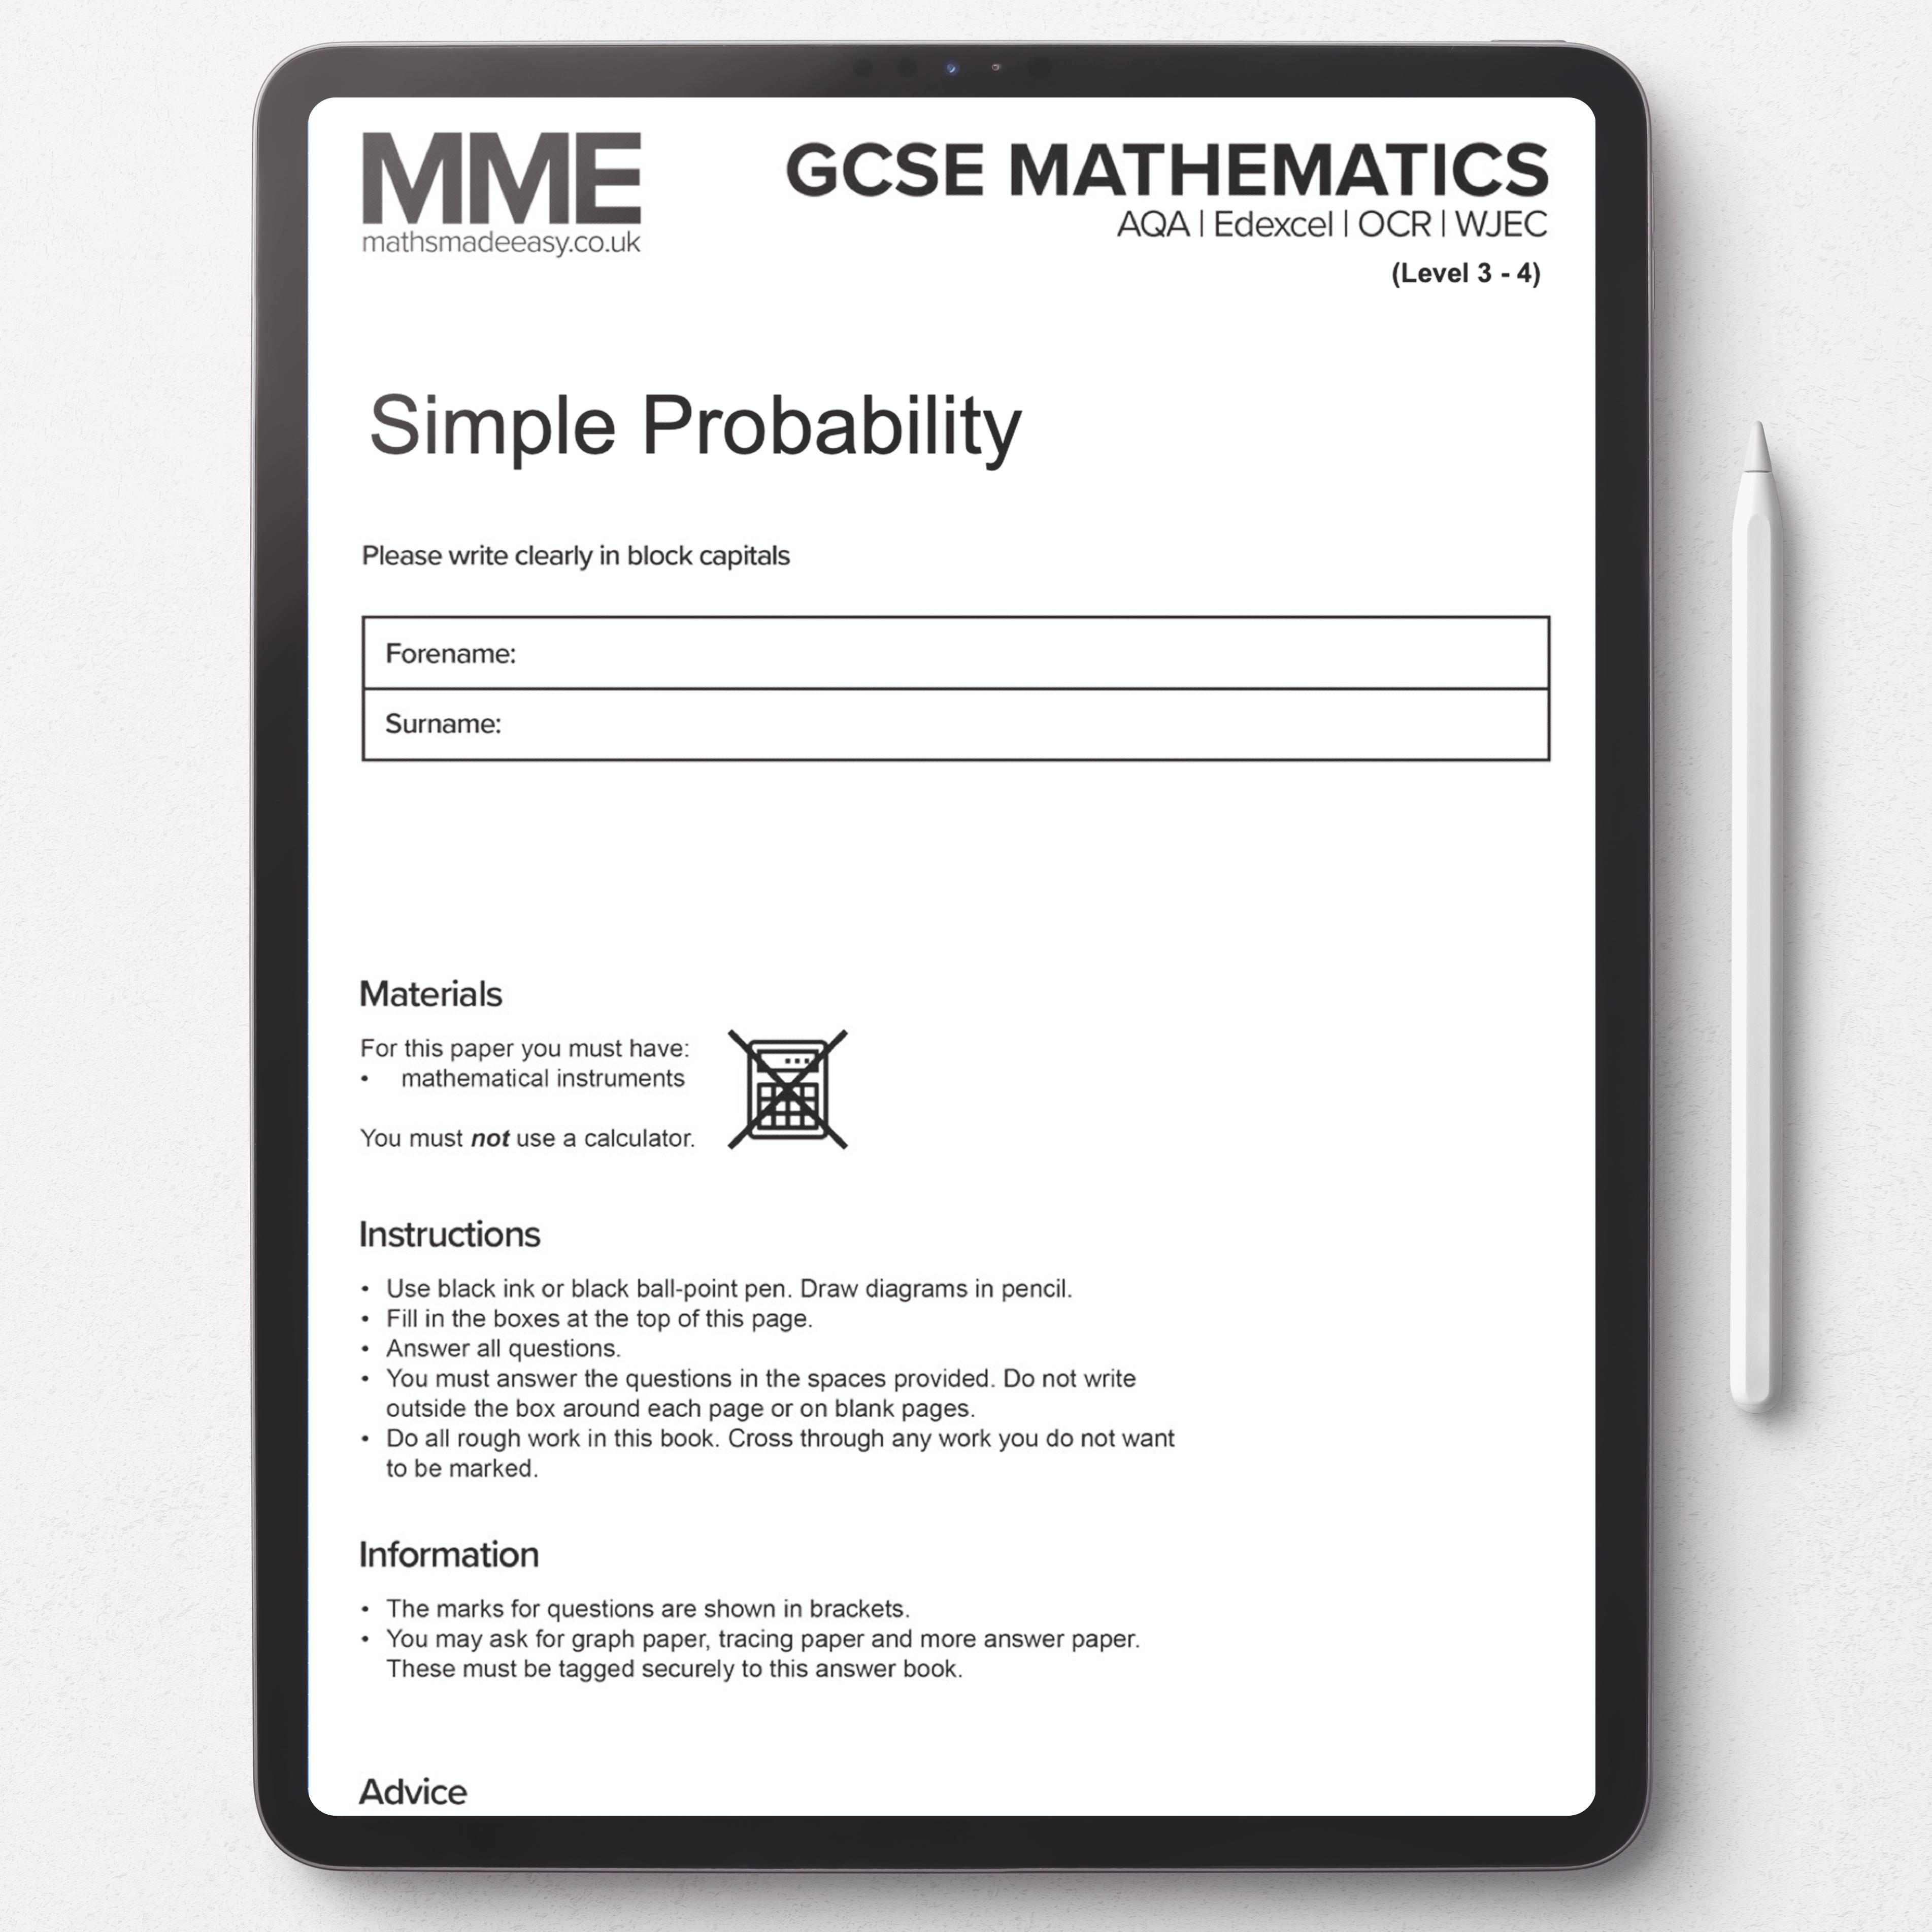 Worksheet 007 Draw Diagram Simple Probability Mathematics [ 3806 x 3806 Pixel ]